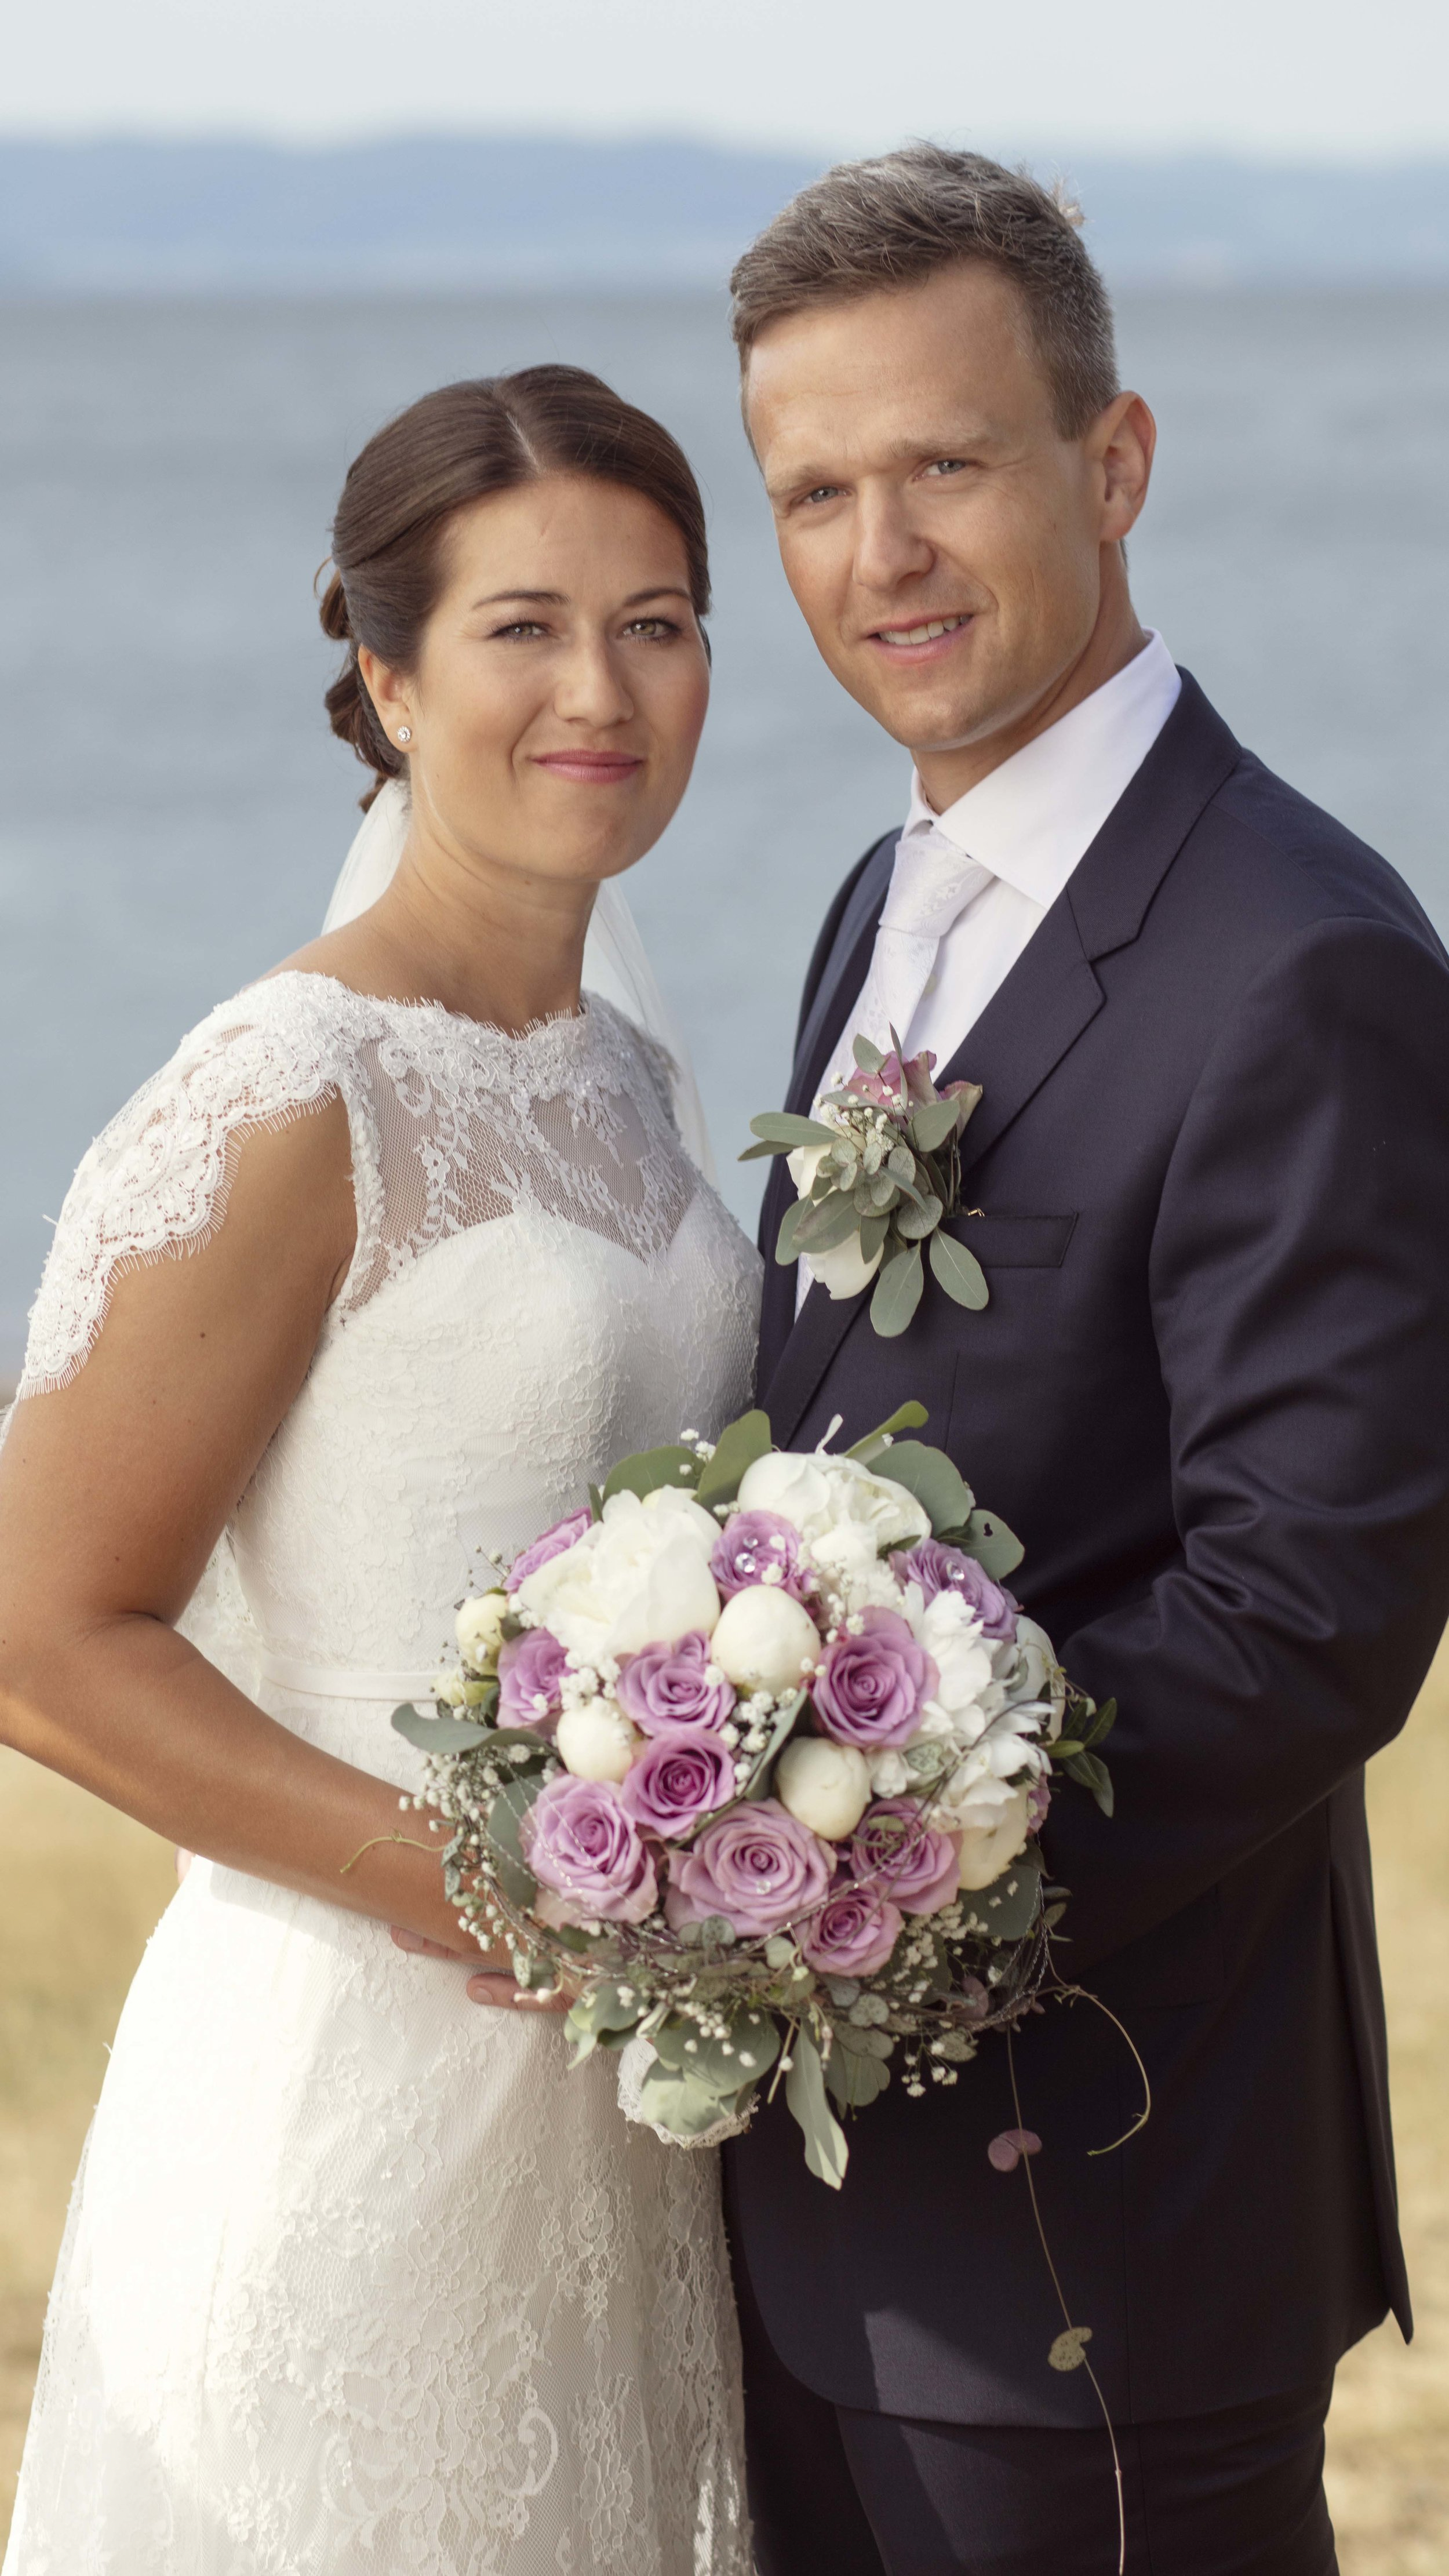 Bryllup-instastory_012.jpg